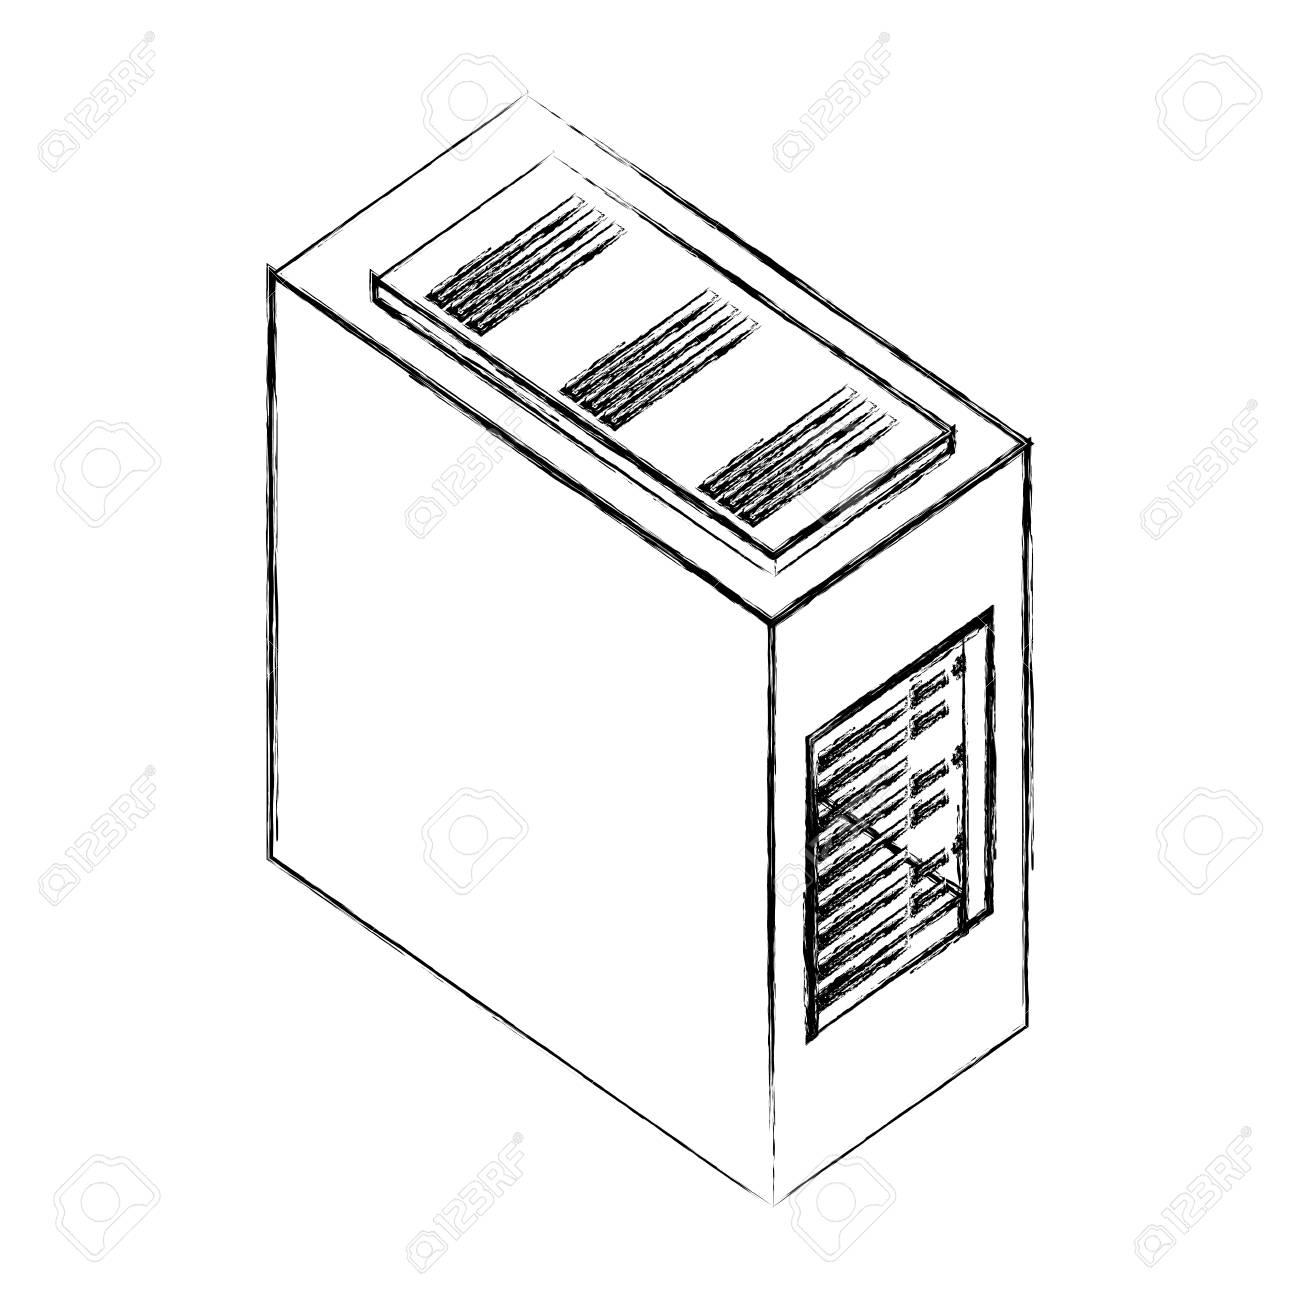 cpu drawing wiring diagram database Computer Case Parts puter server case cpu hardware vector illustration hand drawing keyboard cartoon drawing cpu drawing